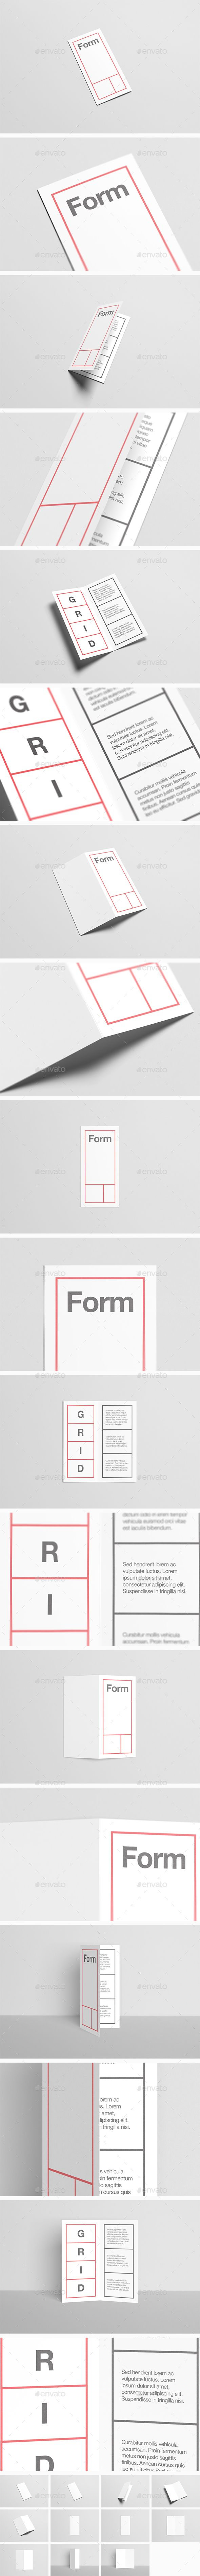 Dl BiFold  HalfFold Brochure MockUp  Mockup And Brochures